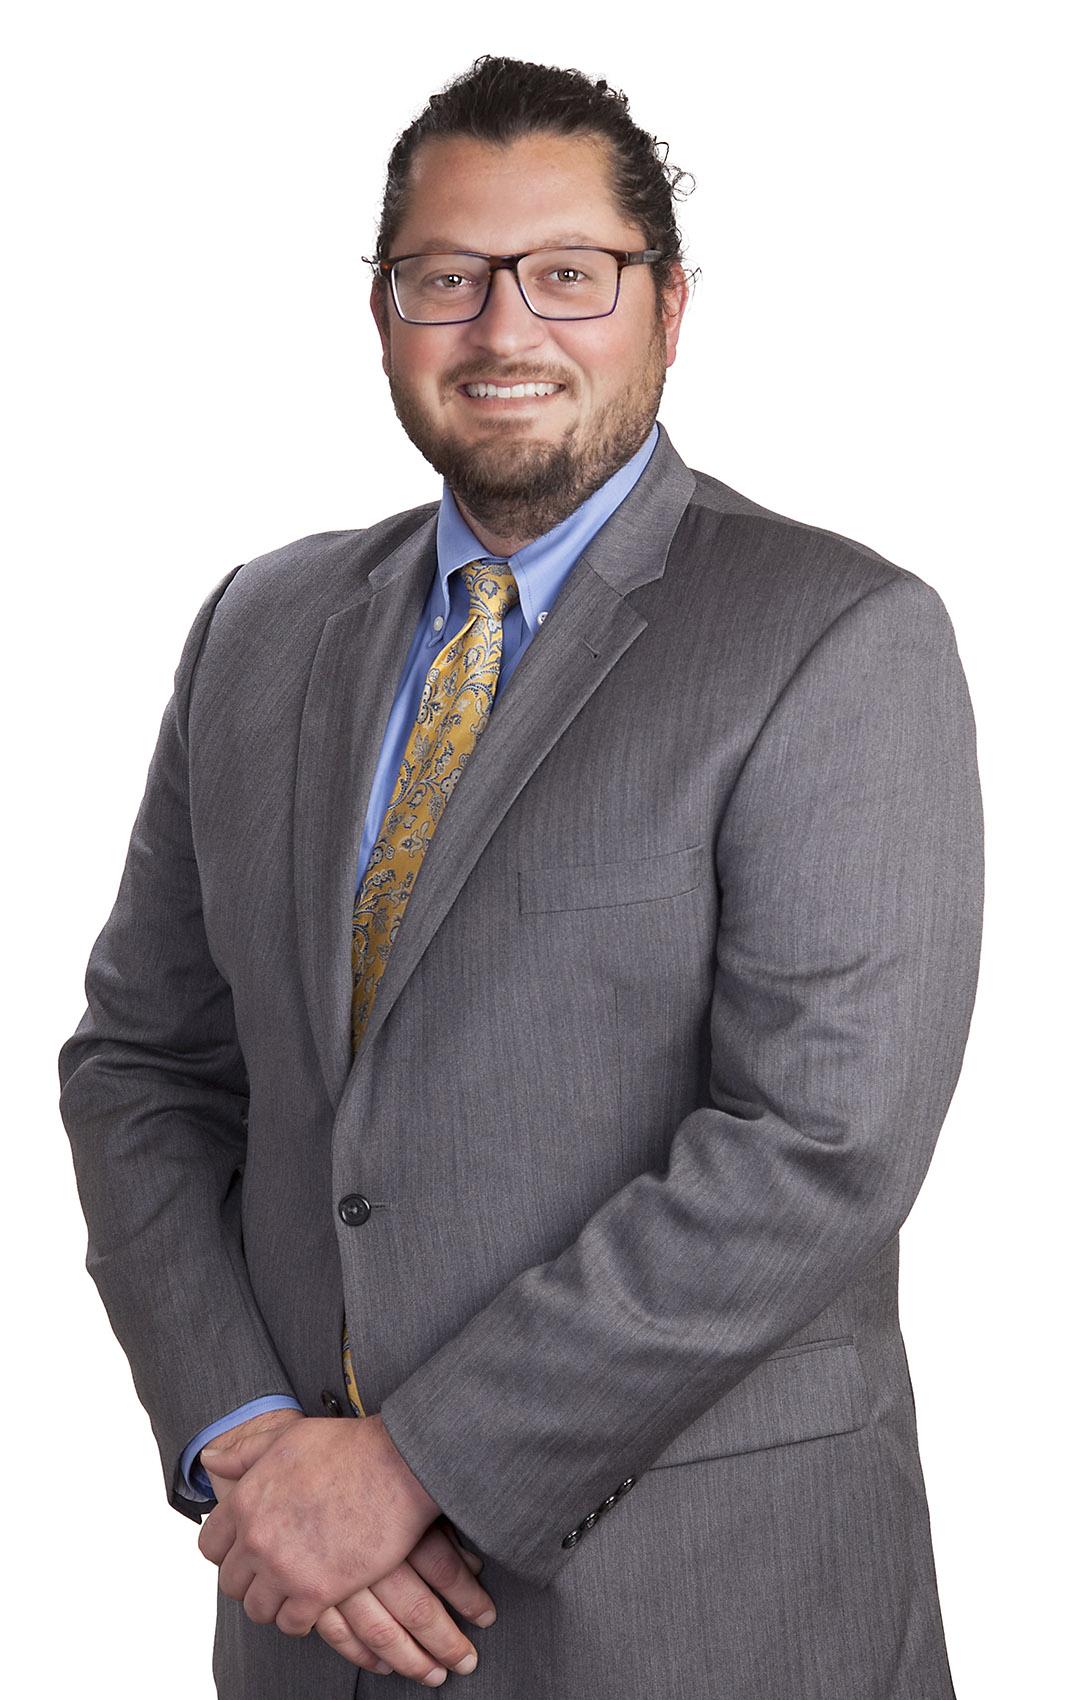 Andrew W. Schultz